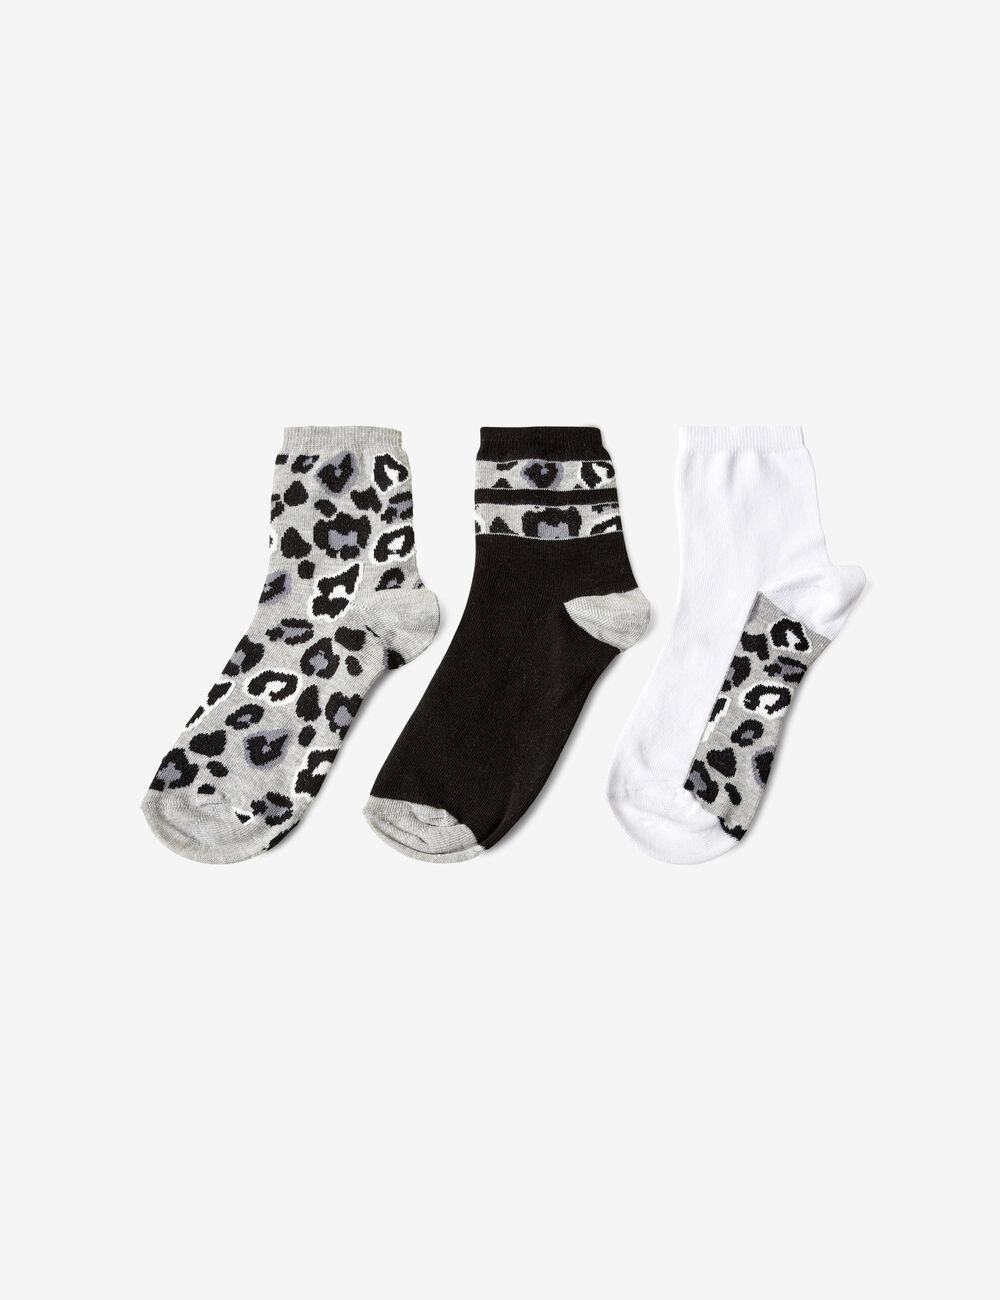 36a7c5fe974 Chaussettes léopard blanches